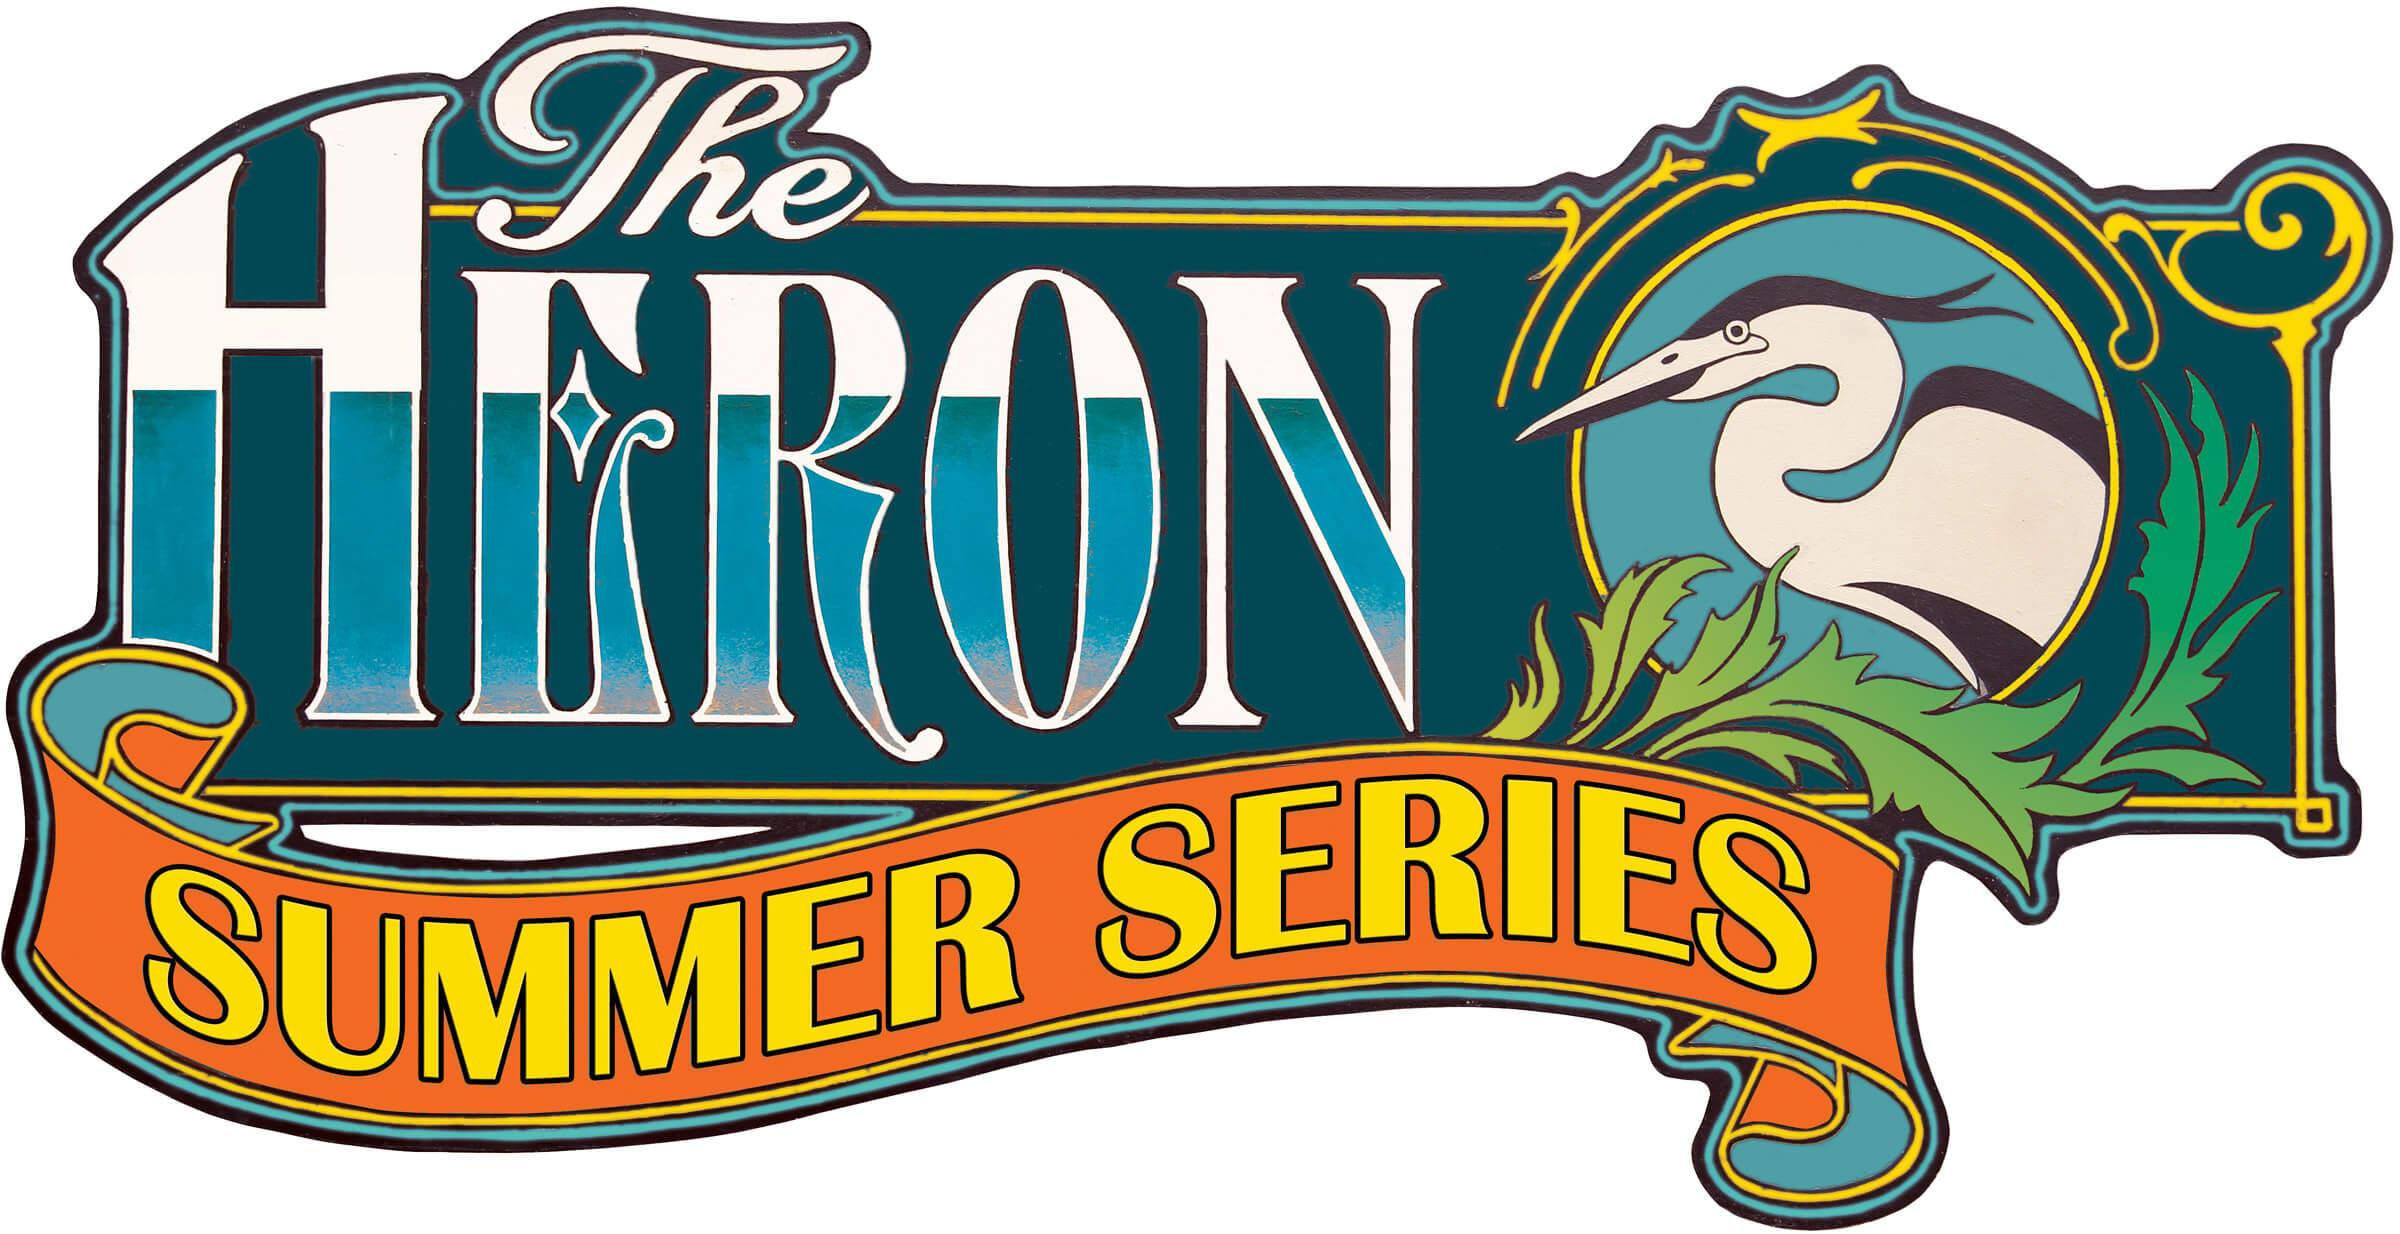 The Heron Summer Series